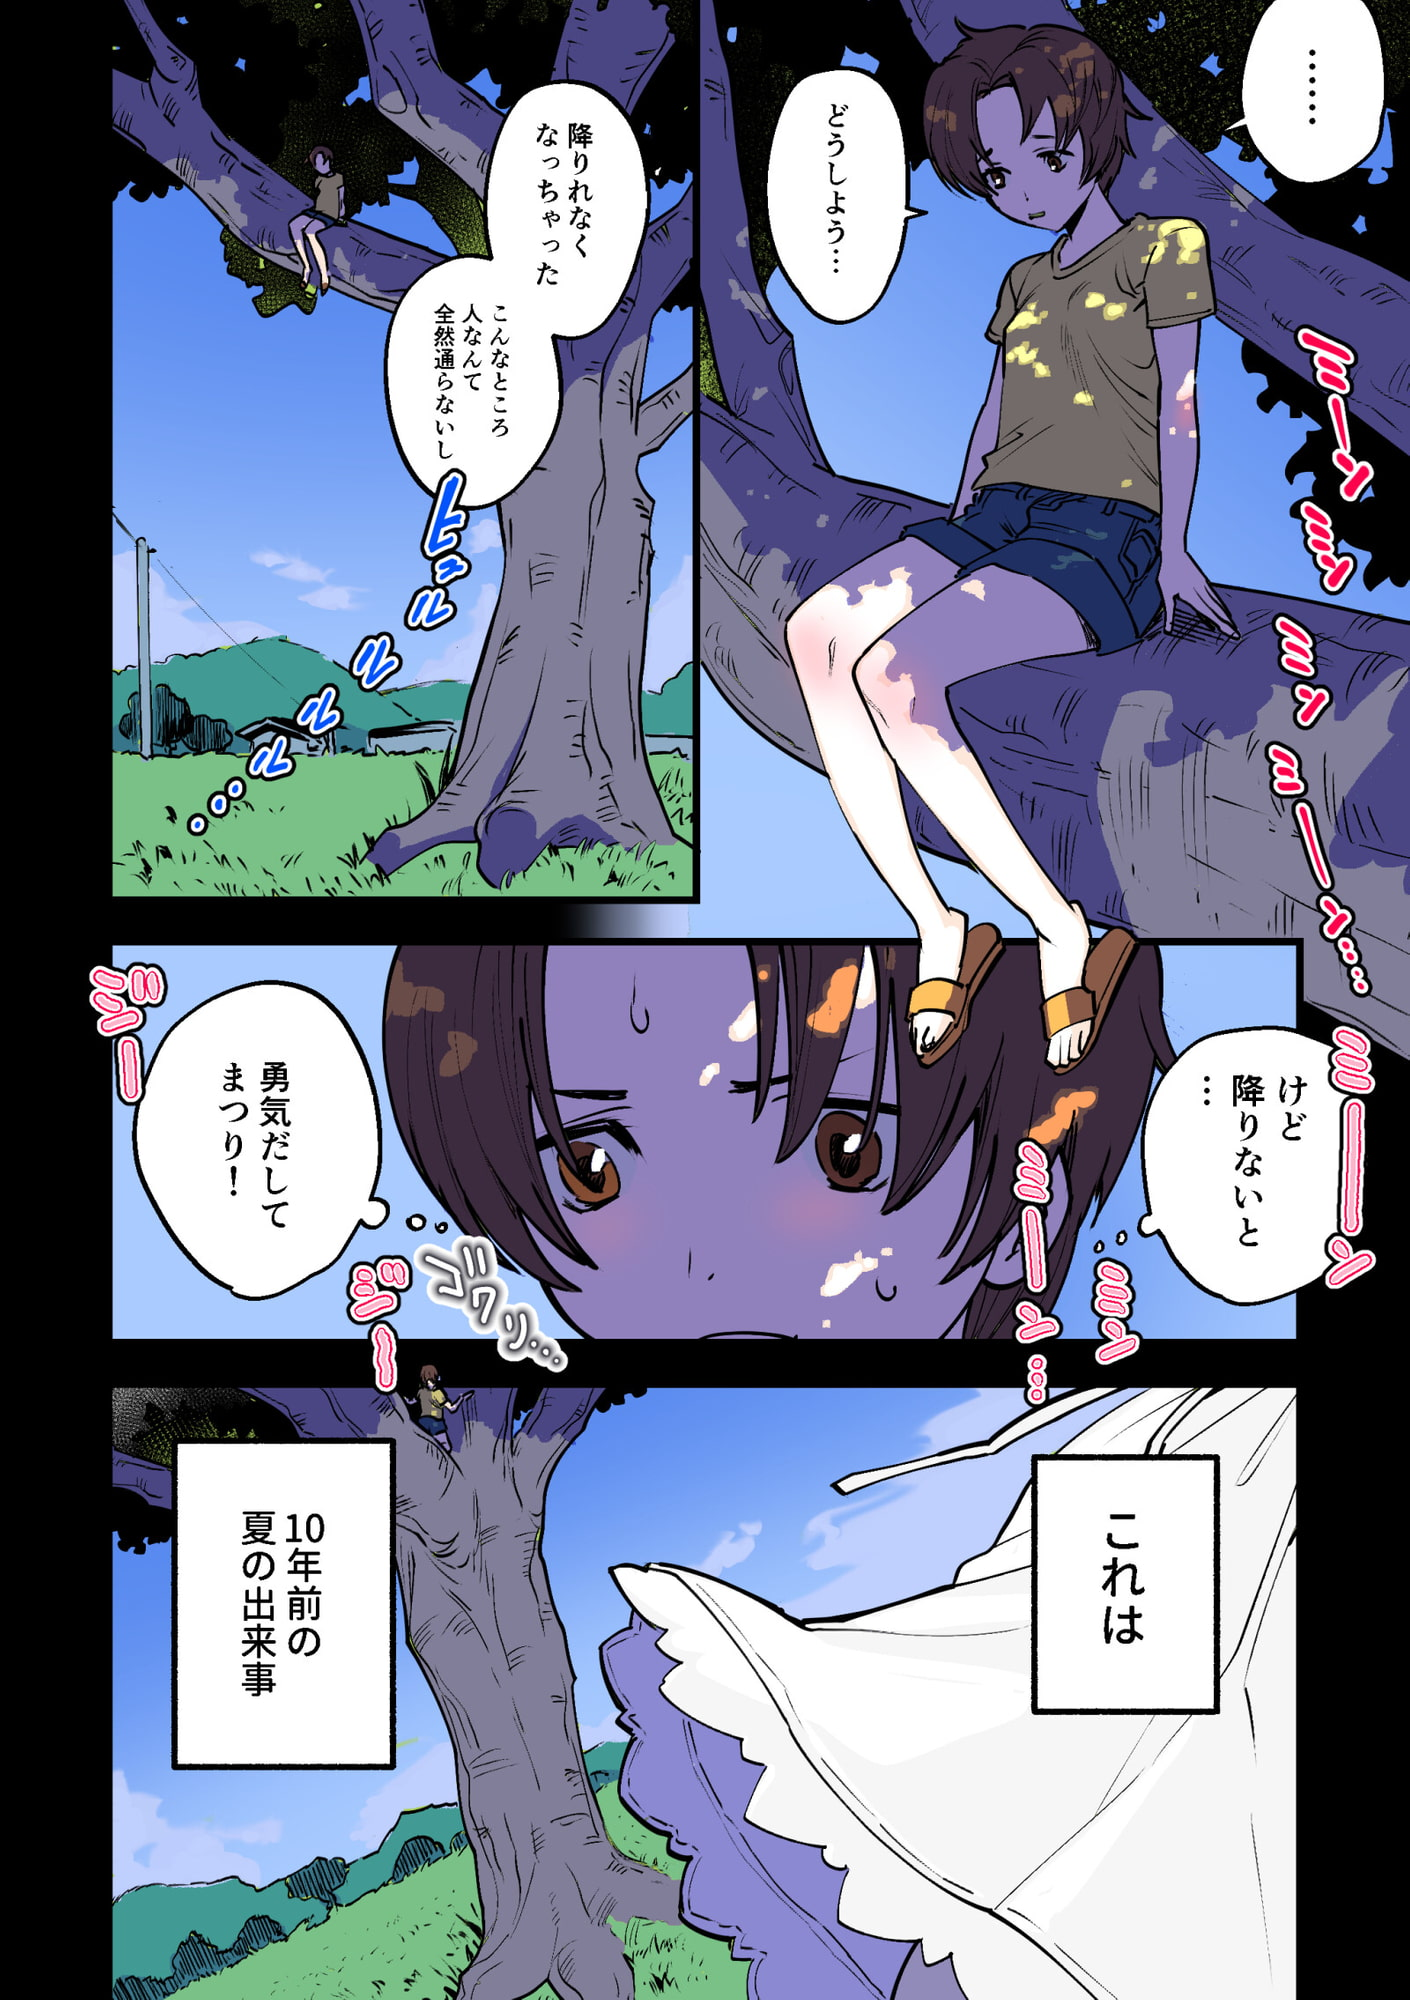 RJ341651 永遠に続く夏~ふたなり怪異×少女~ [20210902]